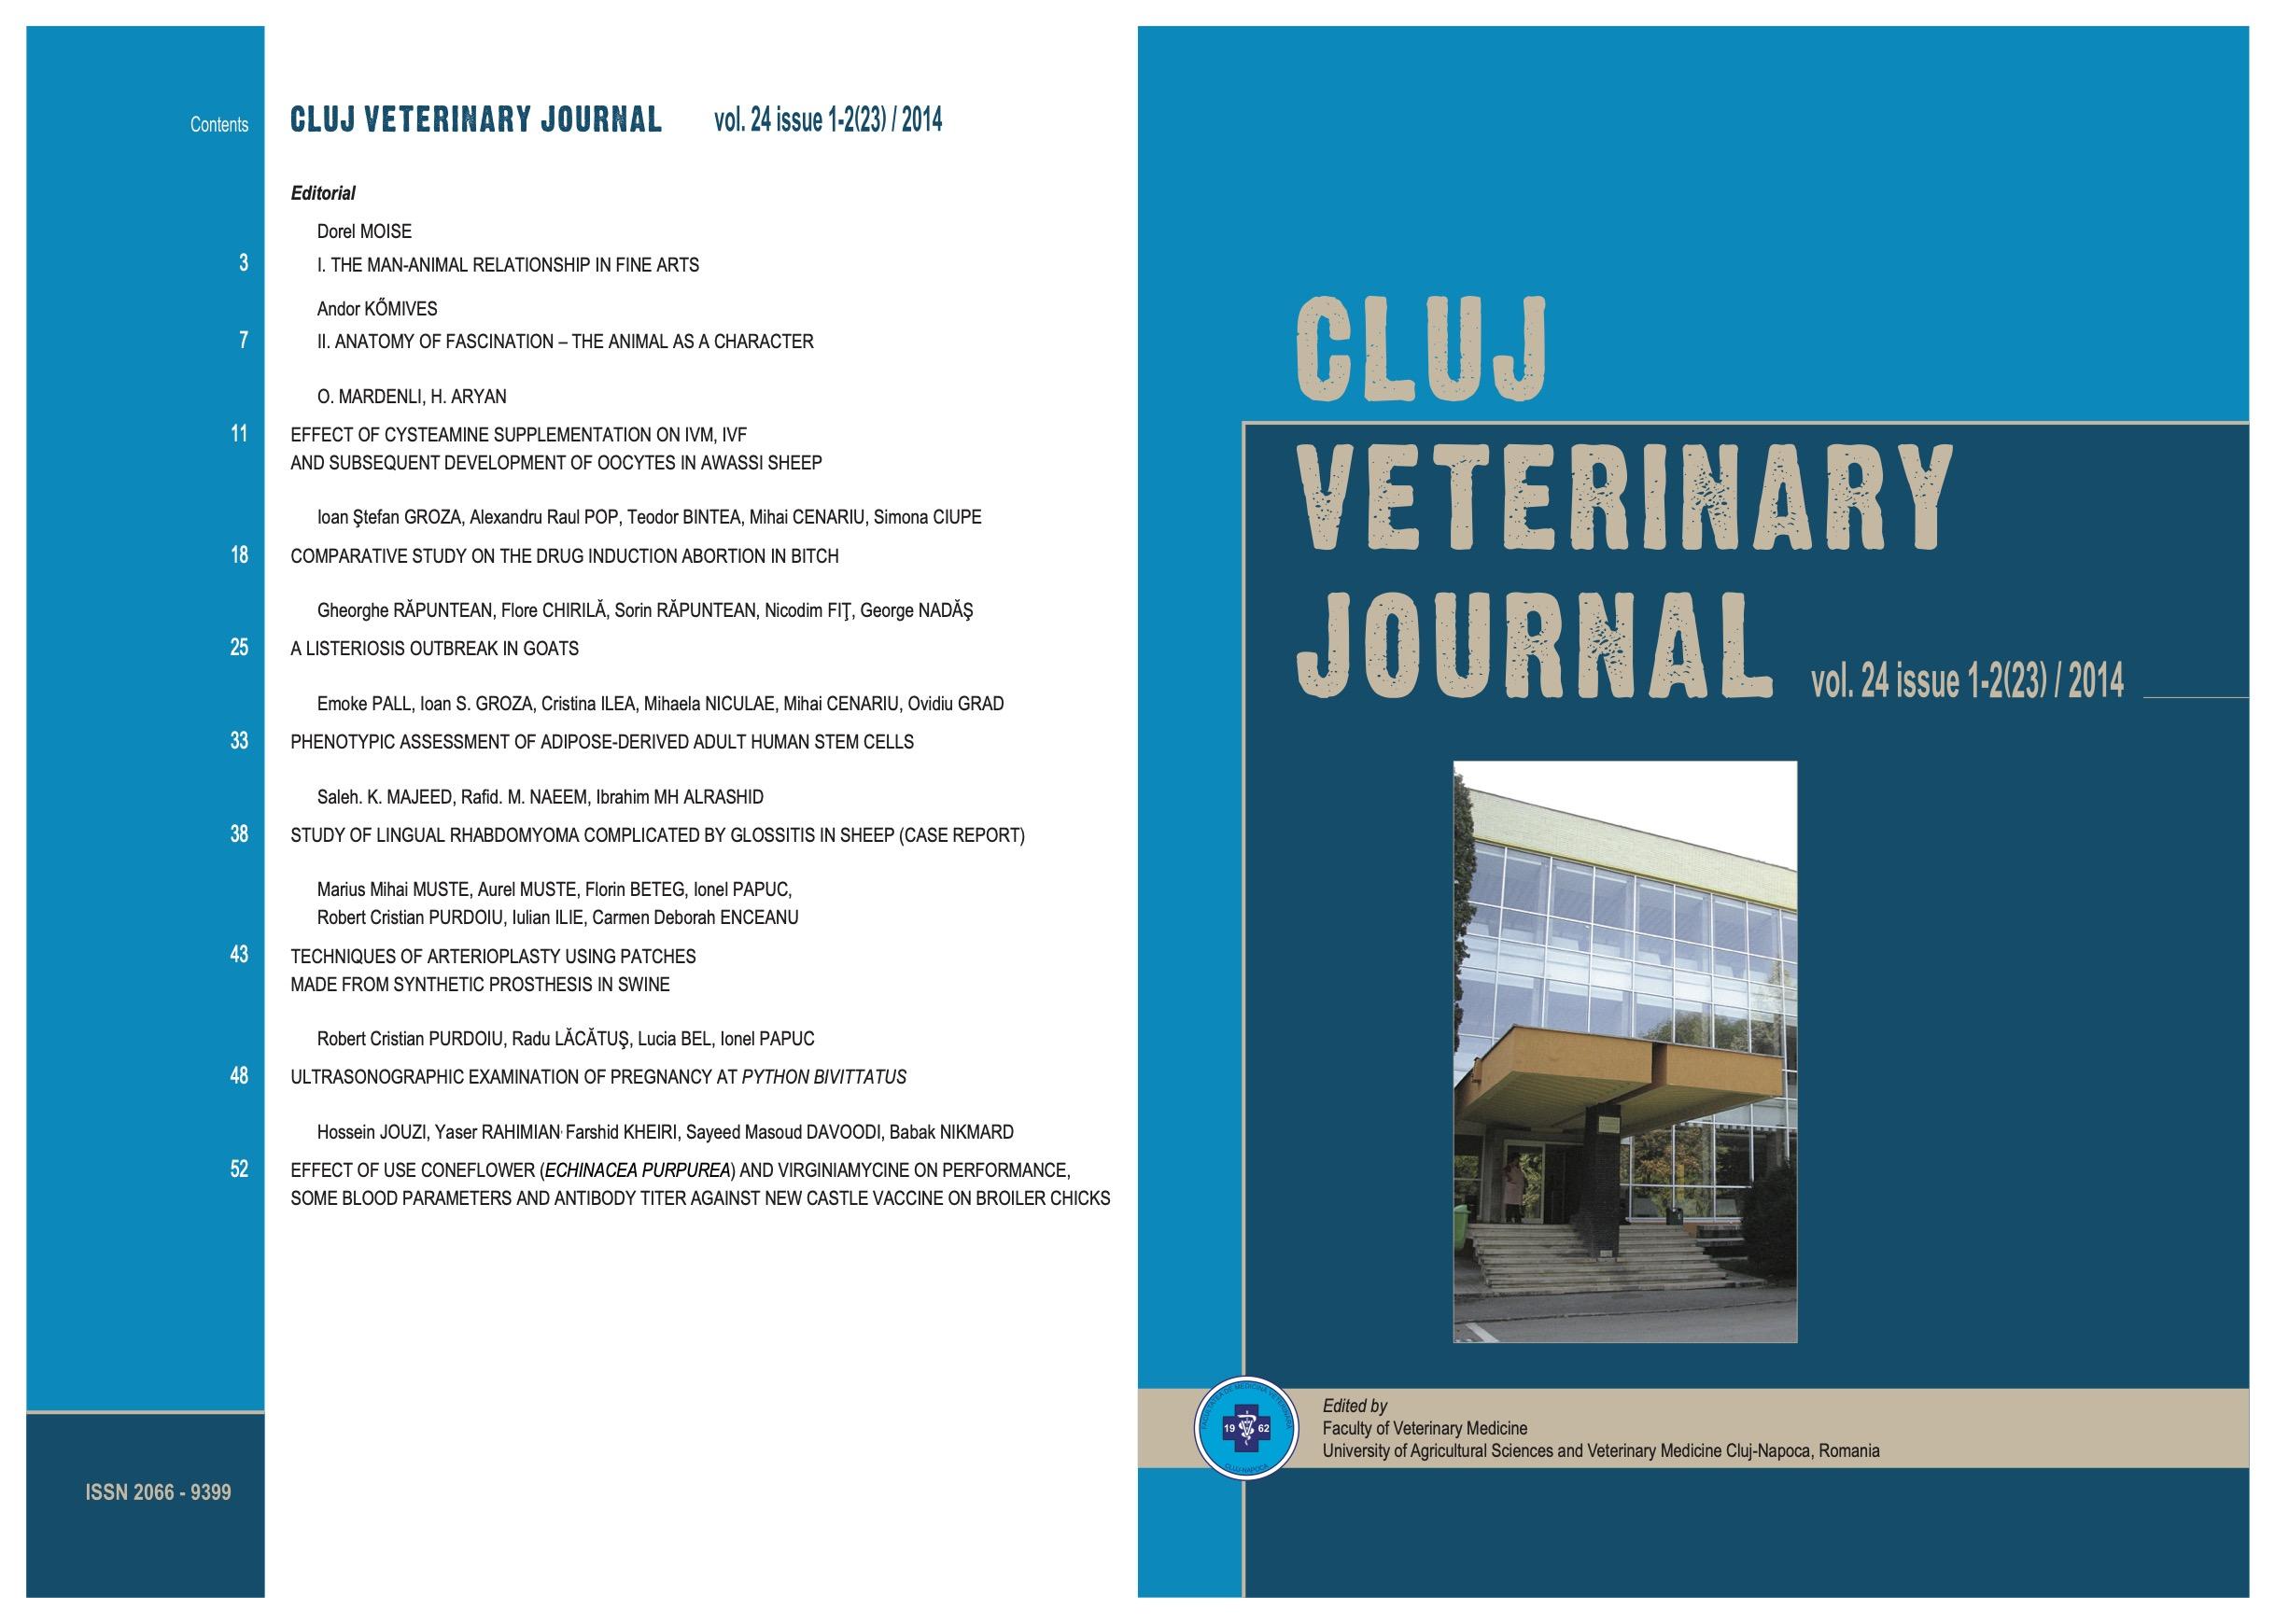 View Vol. 24 No. 1-2(23) (2014): Cluj Veterinary Journal